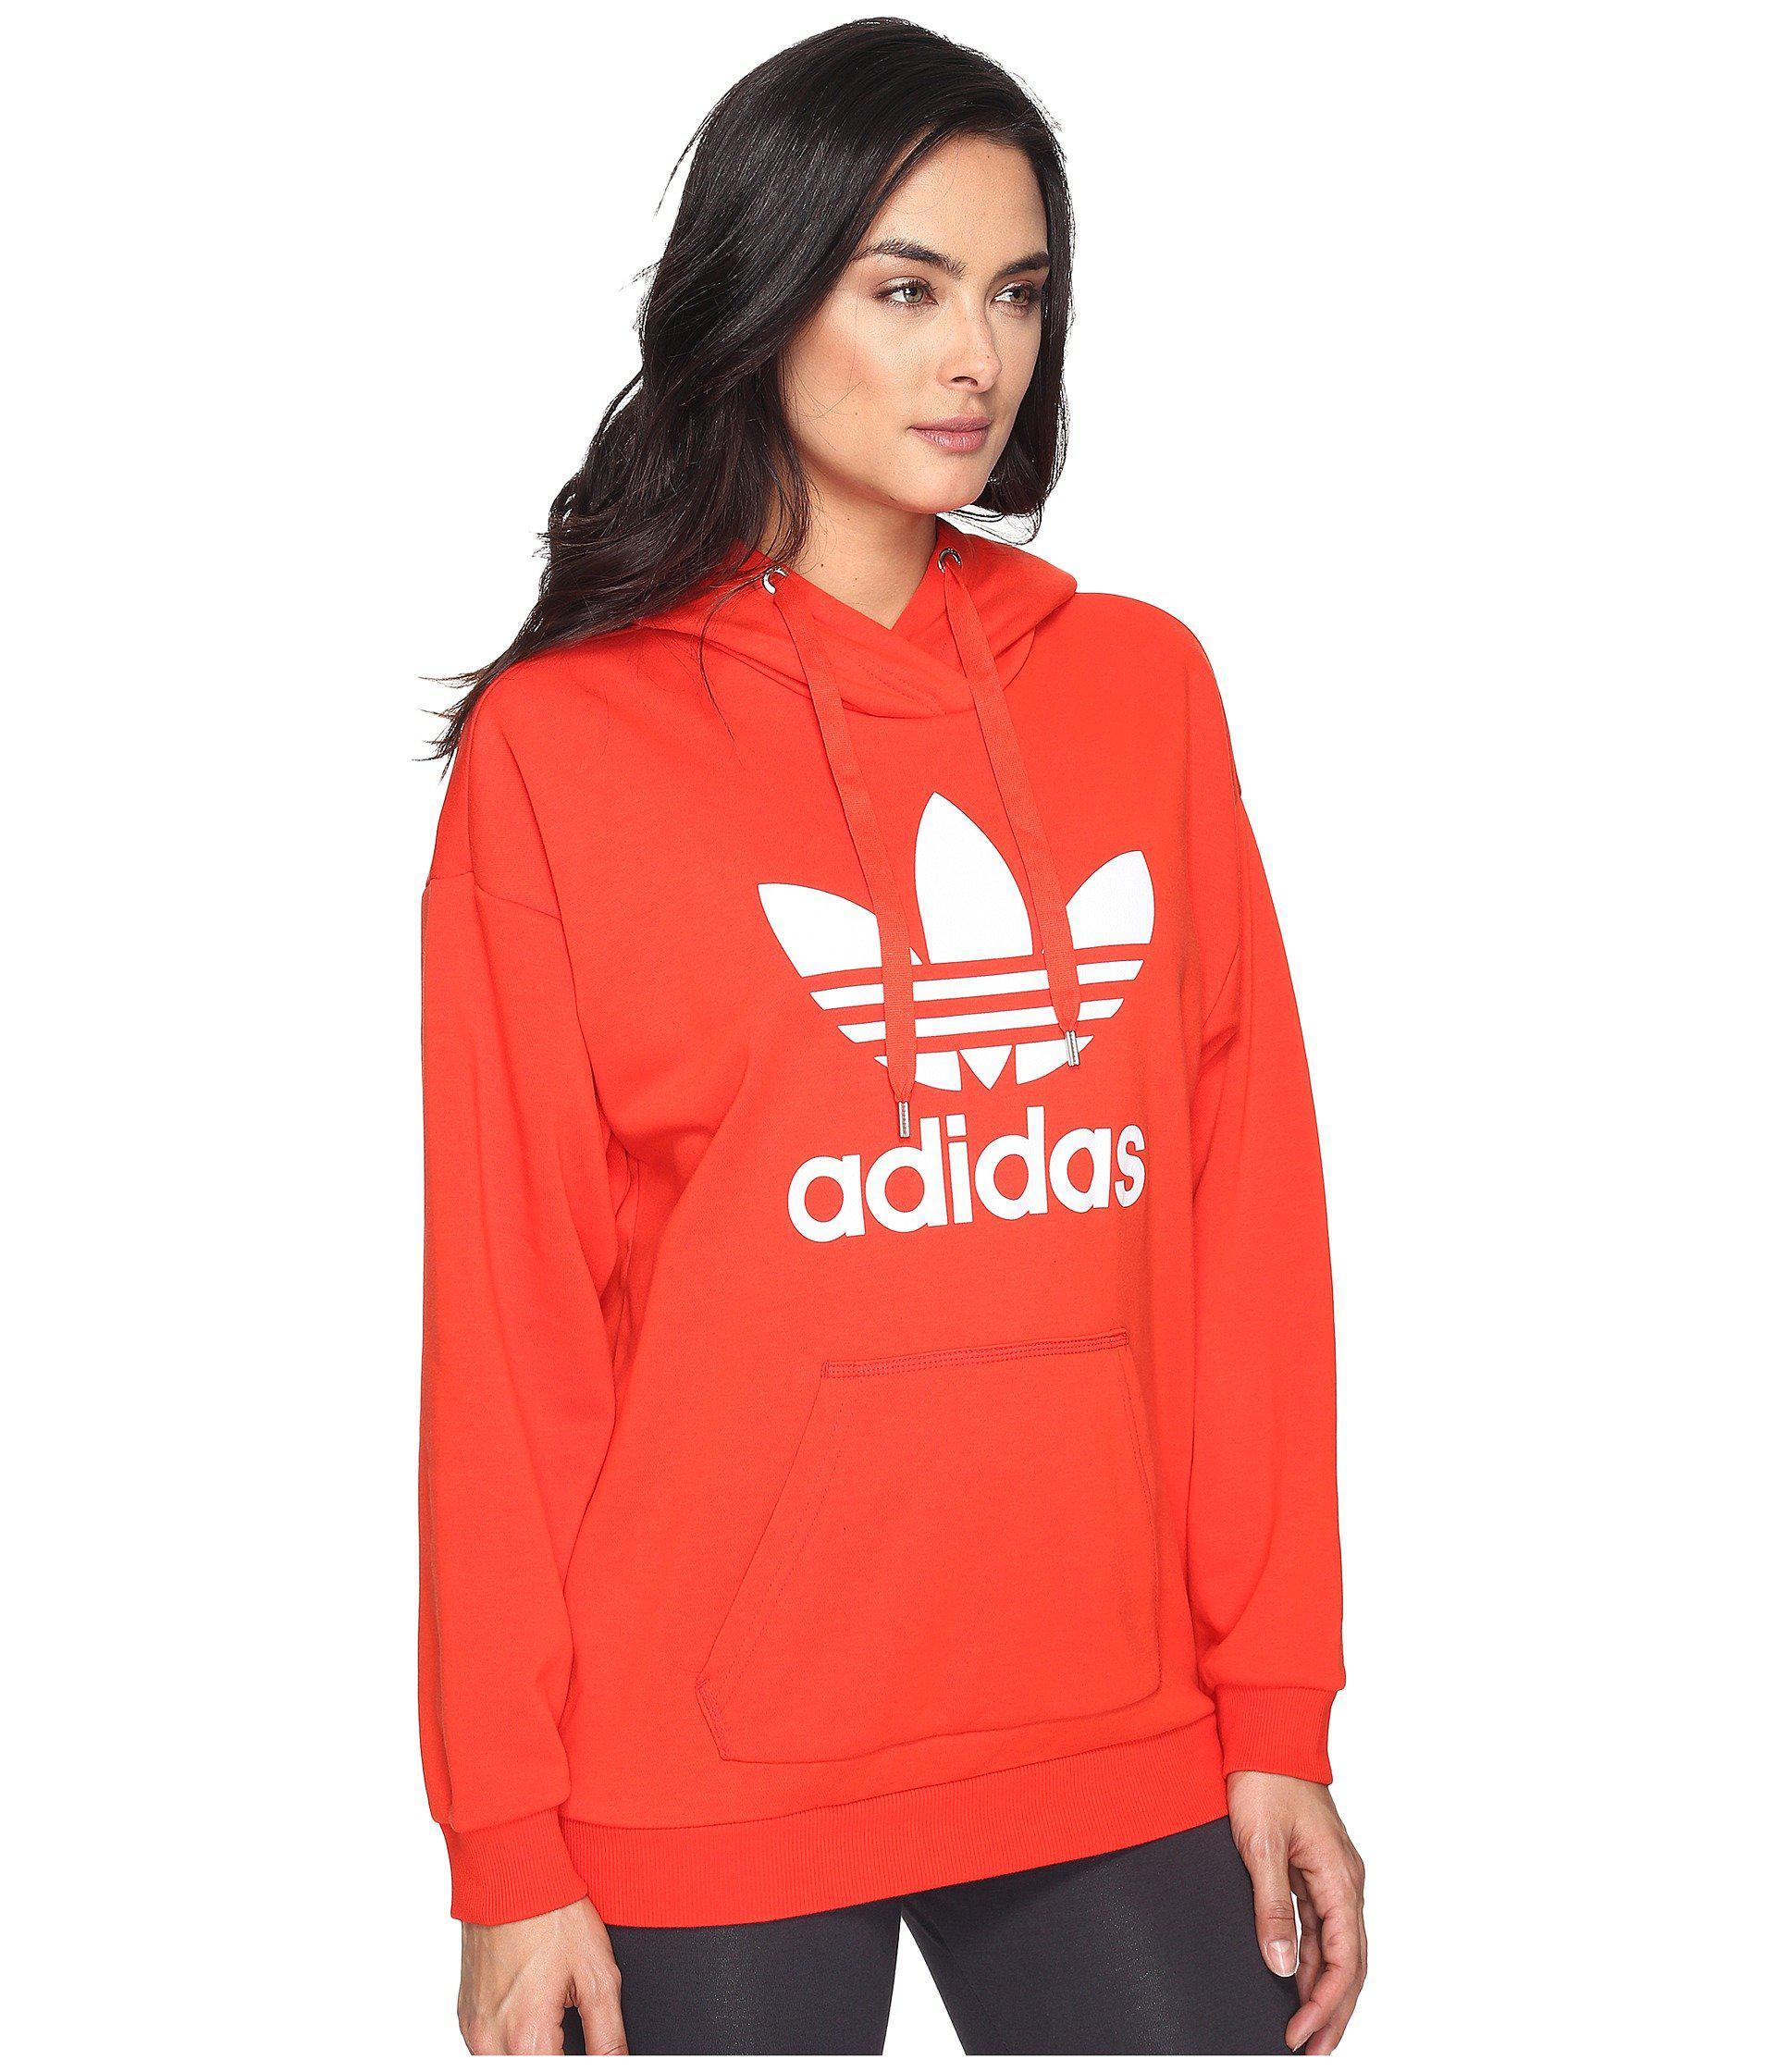 adidas hoodie dress womens